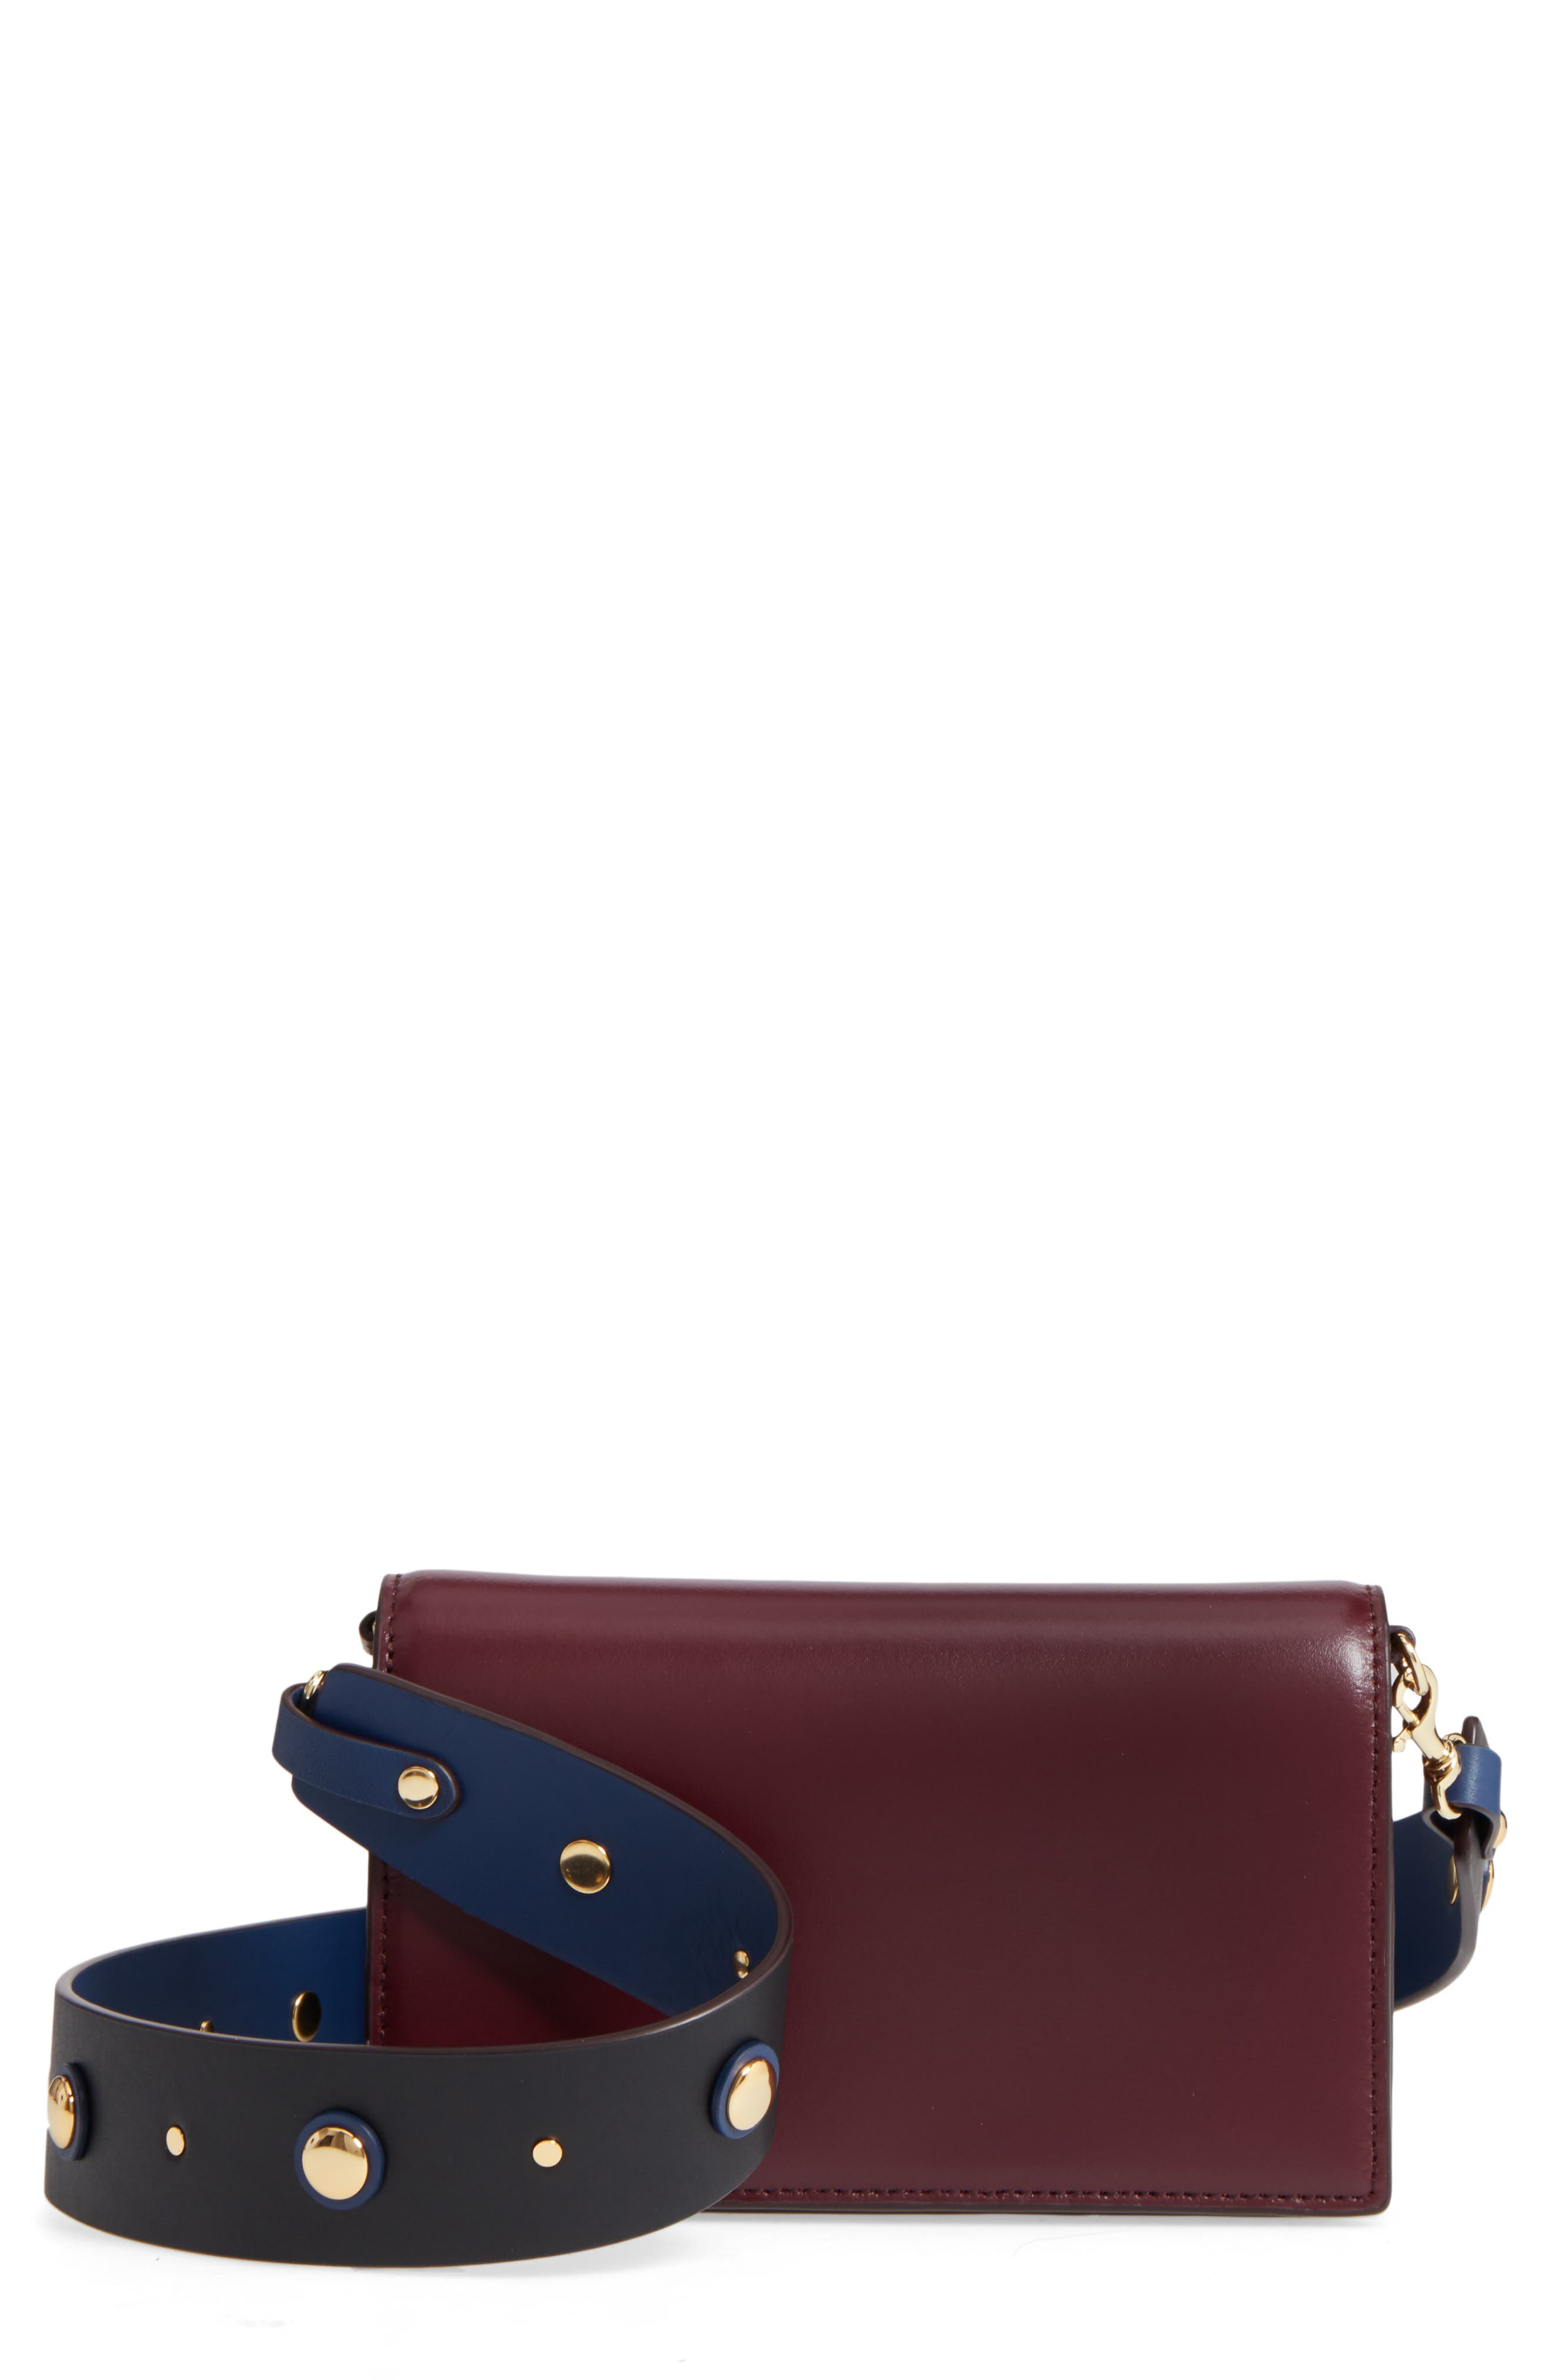 Diane von Furstenberg Soirée Leather Convertible Crossbody Bag